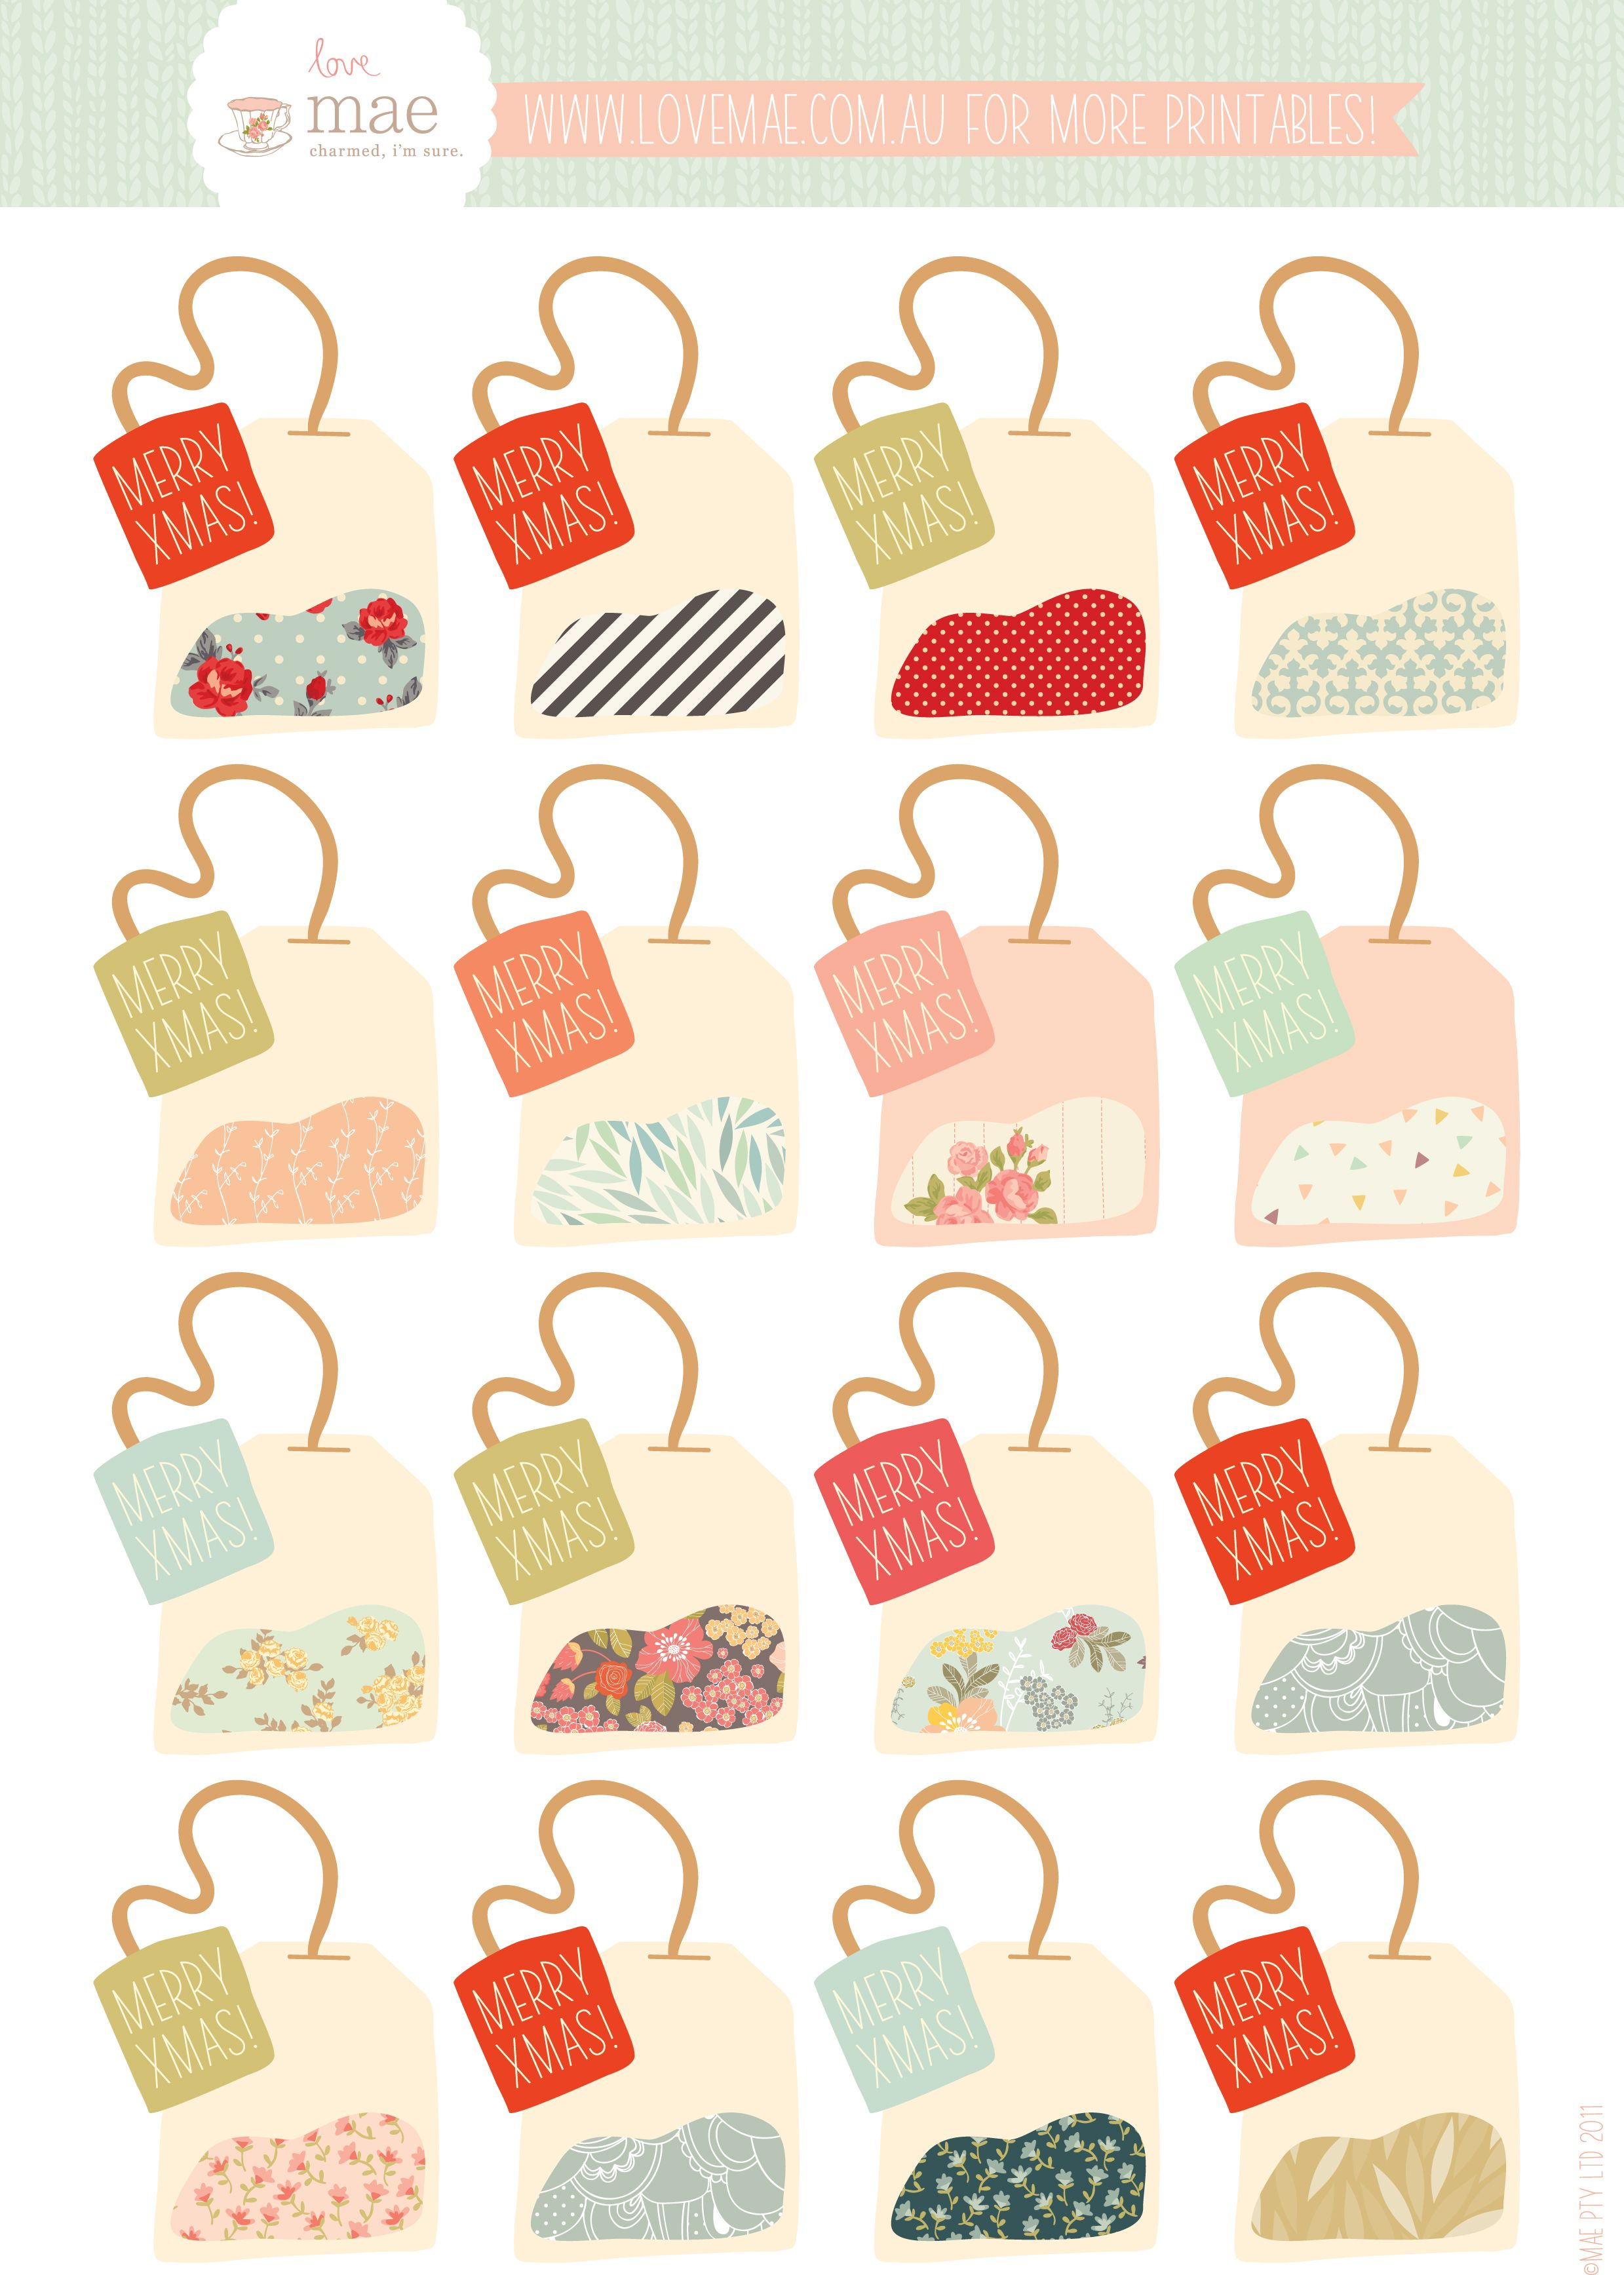 Free printable tea bag gift tags if only it didnt say xmas free printable tea bag gift tags if only it didnt say xmas negle Image collections